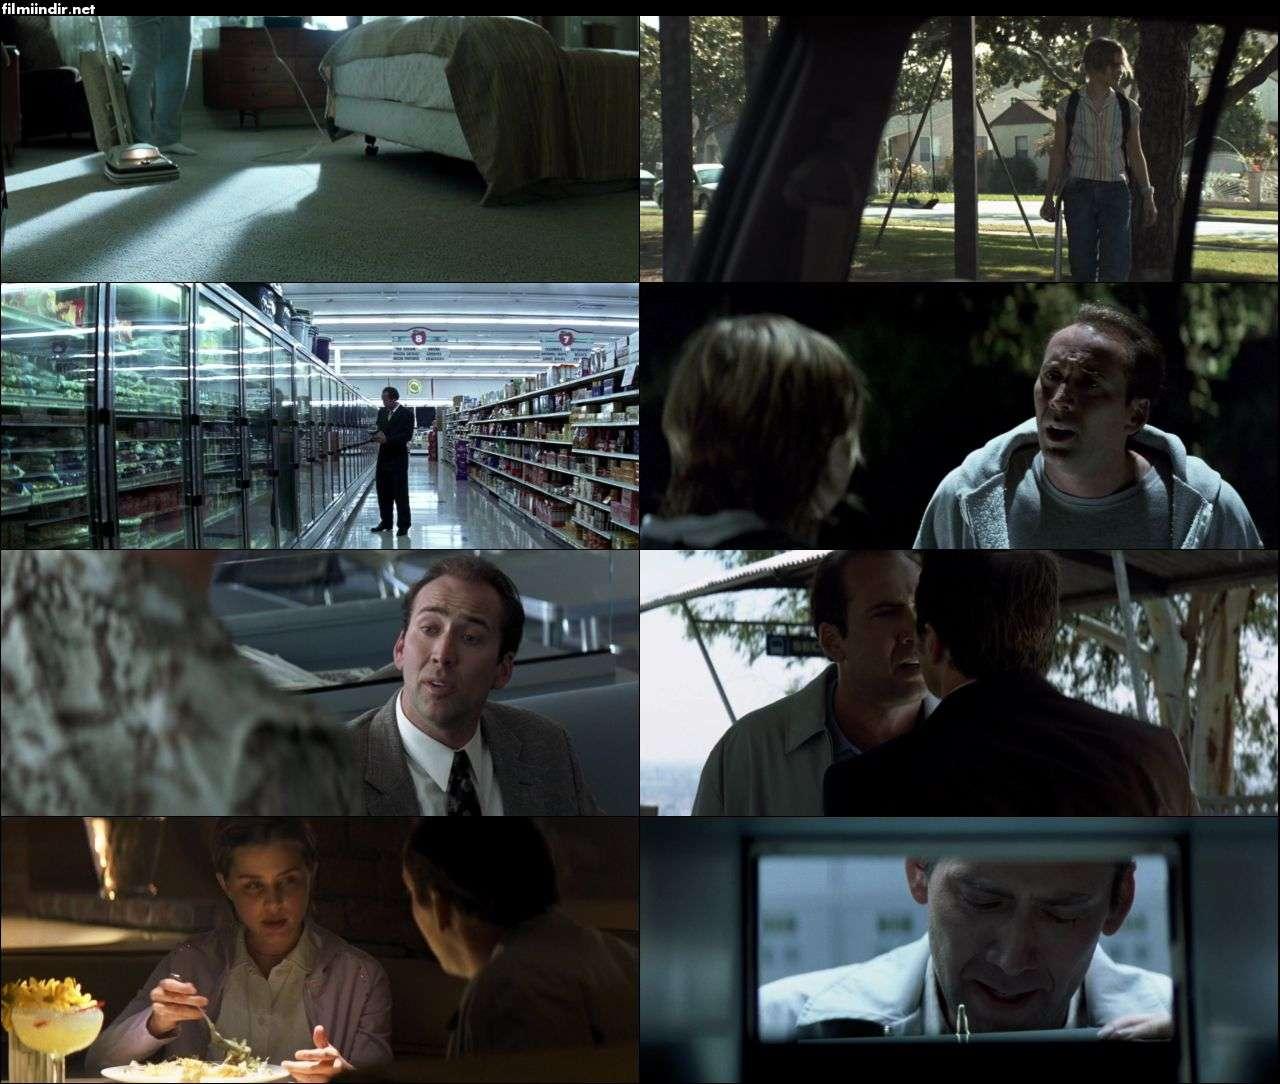 Üçkağıtçılar - Matchstick Men (2003) türkçe dublaj film indir